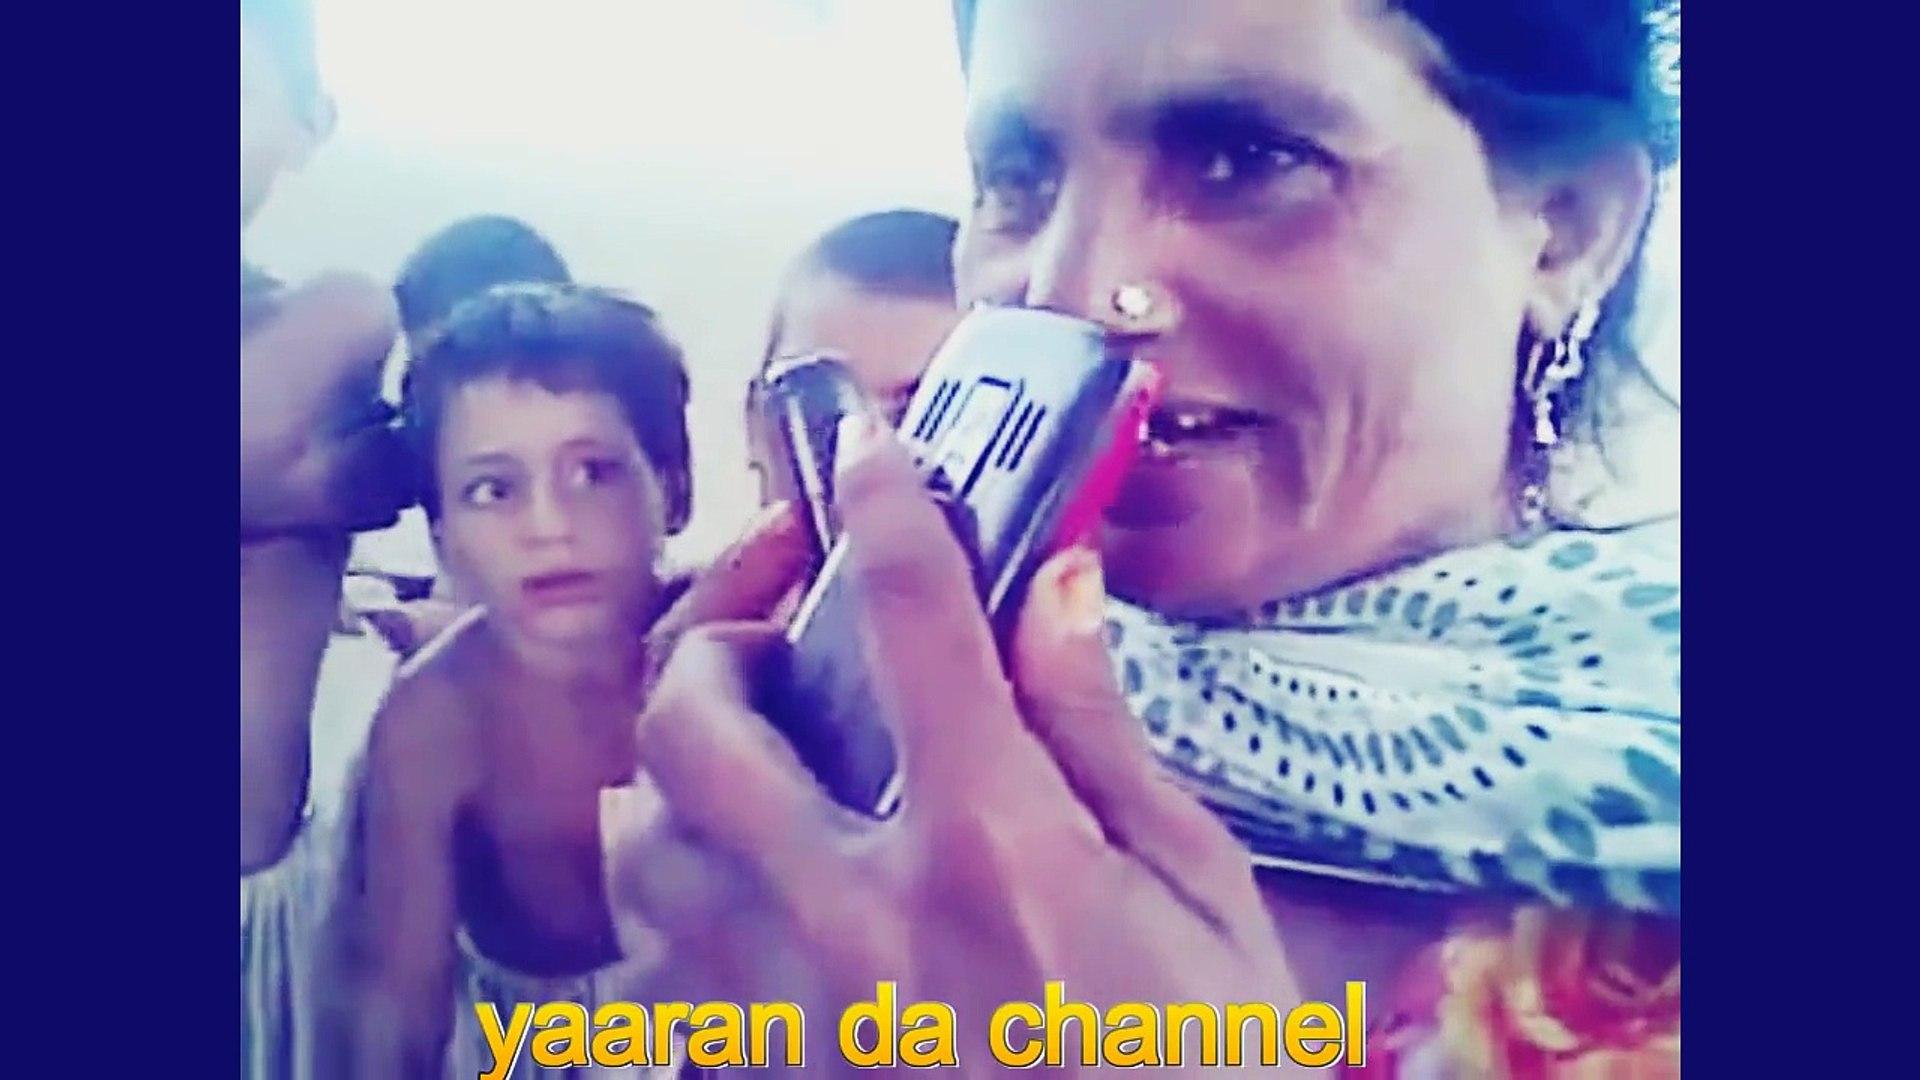 pakistani panjabi culture folk song Channa Tere Vaade Jhoothe Street Singers Punjabi Song